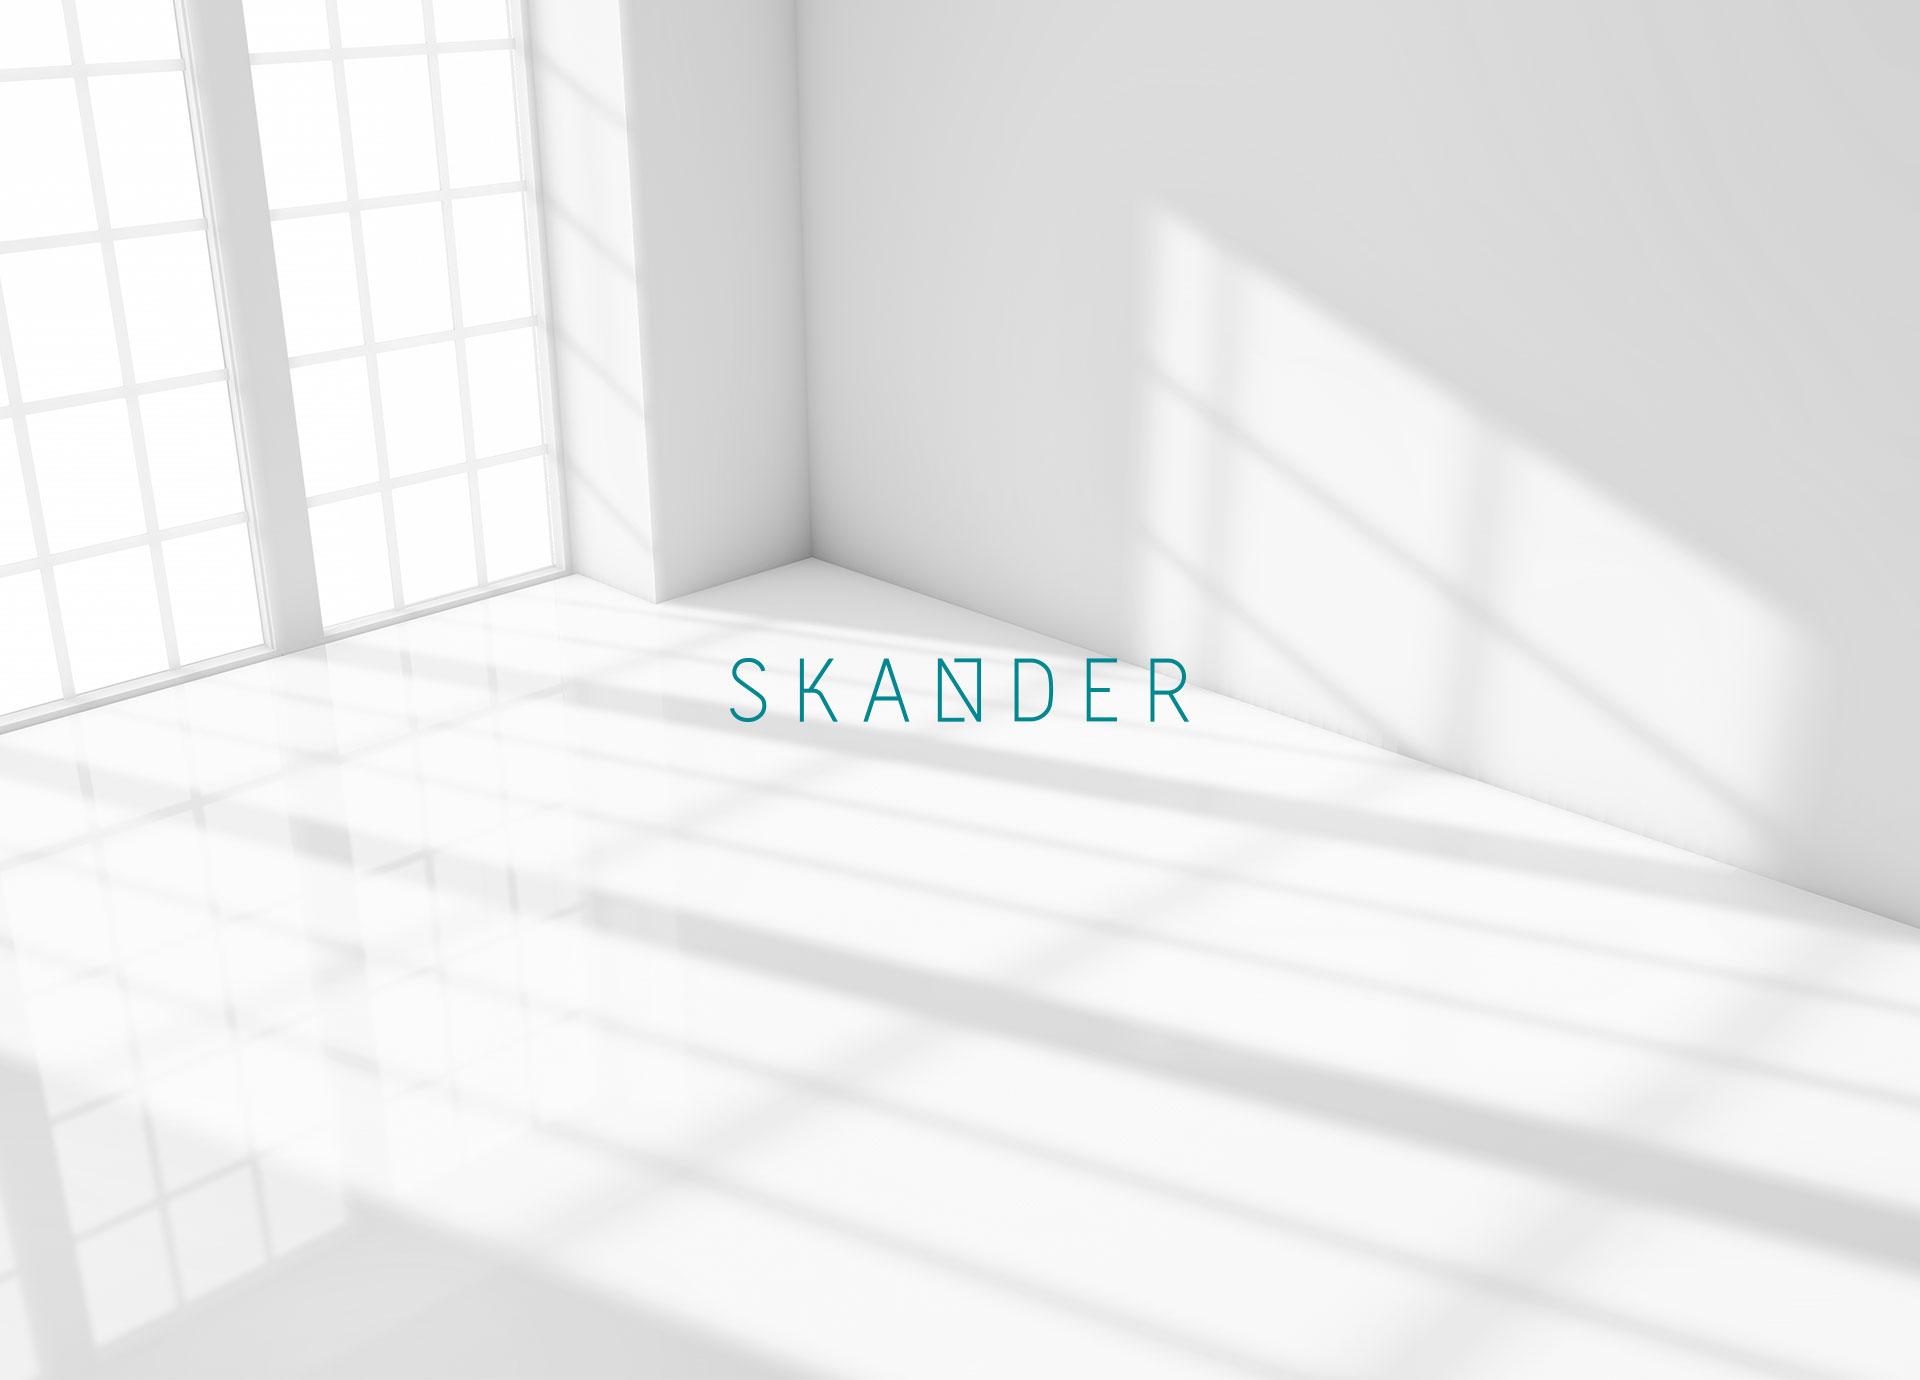 Skander_1_1920x1380